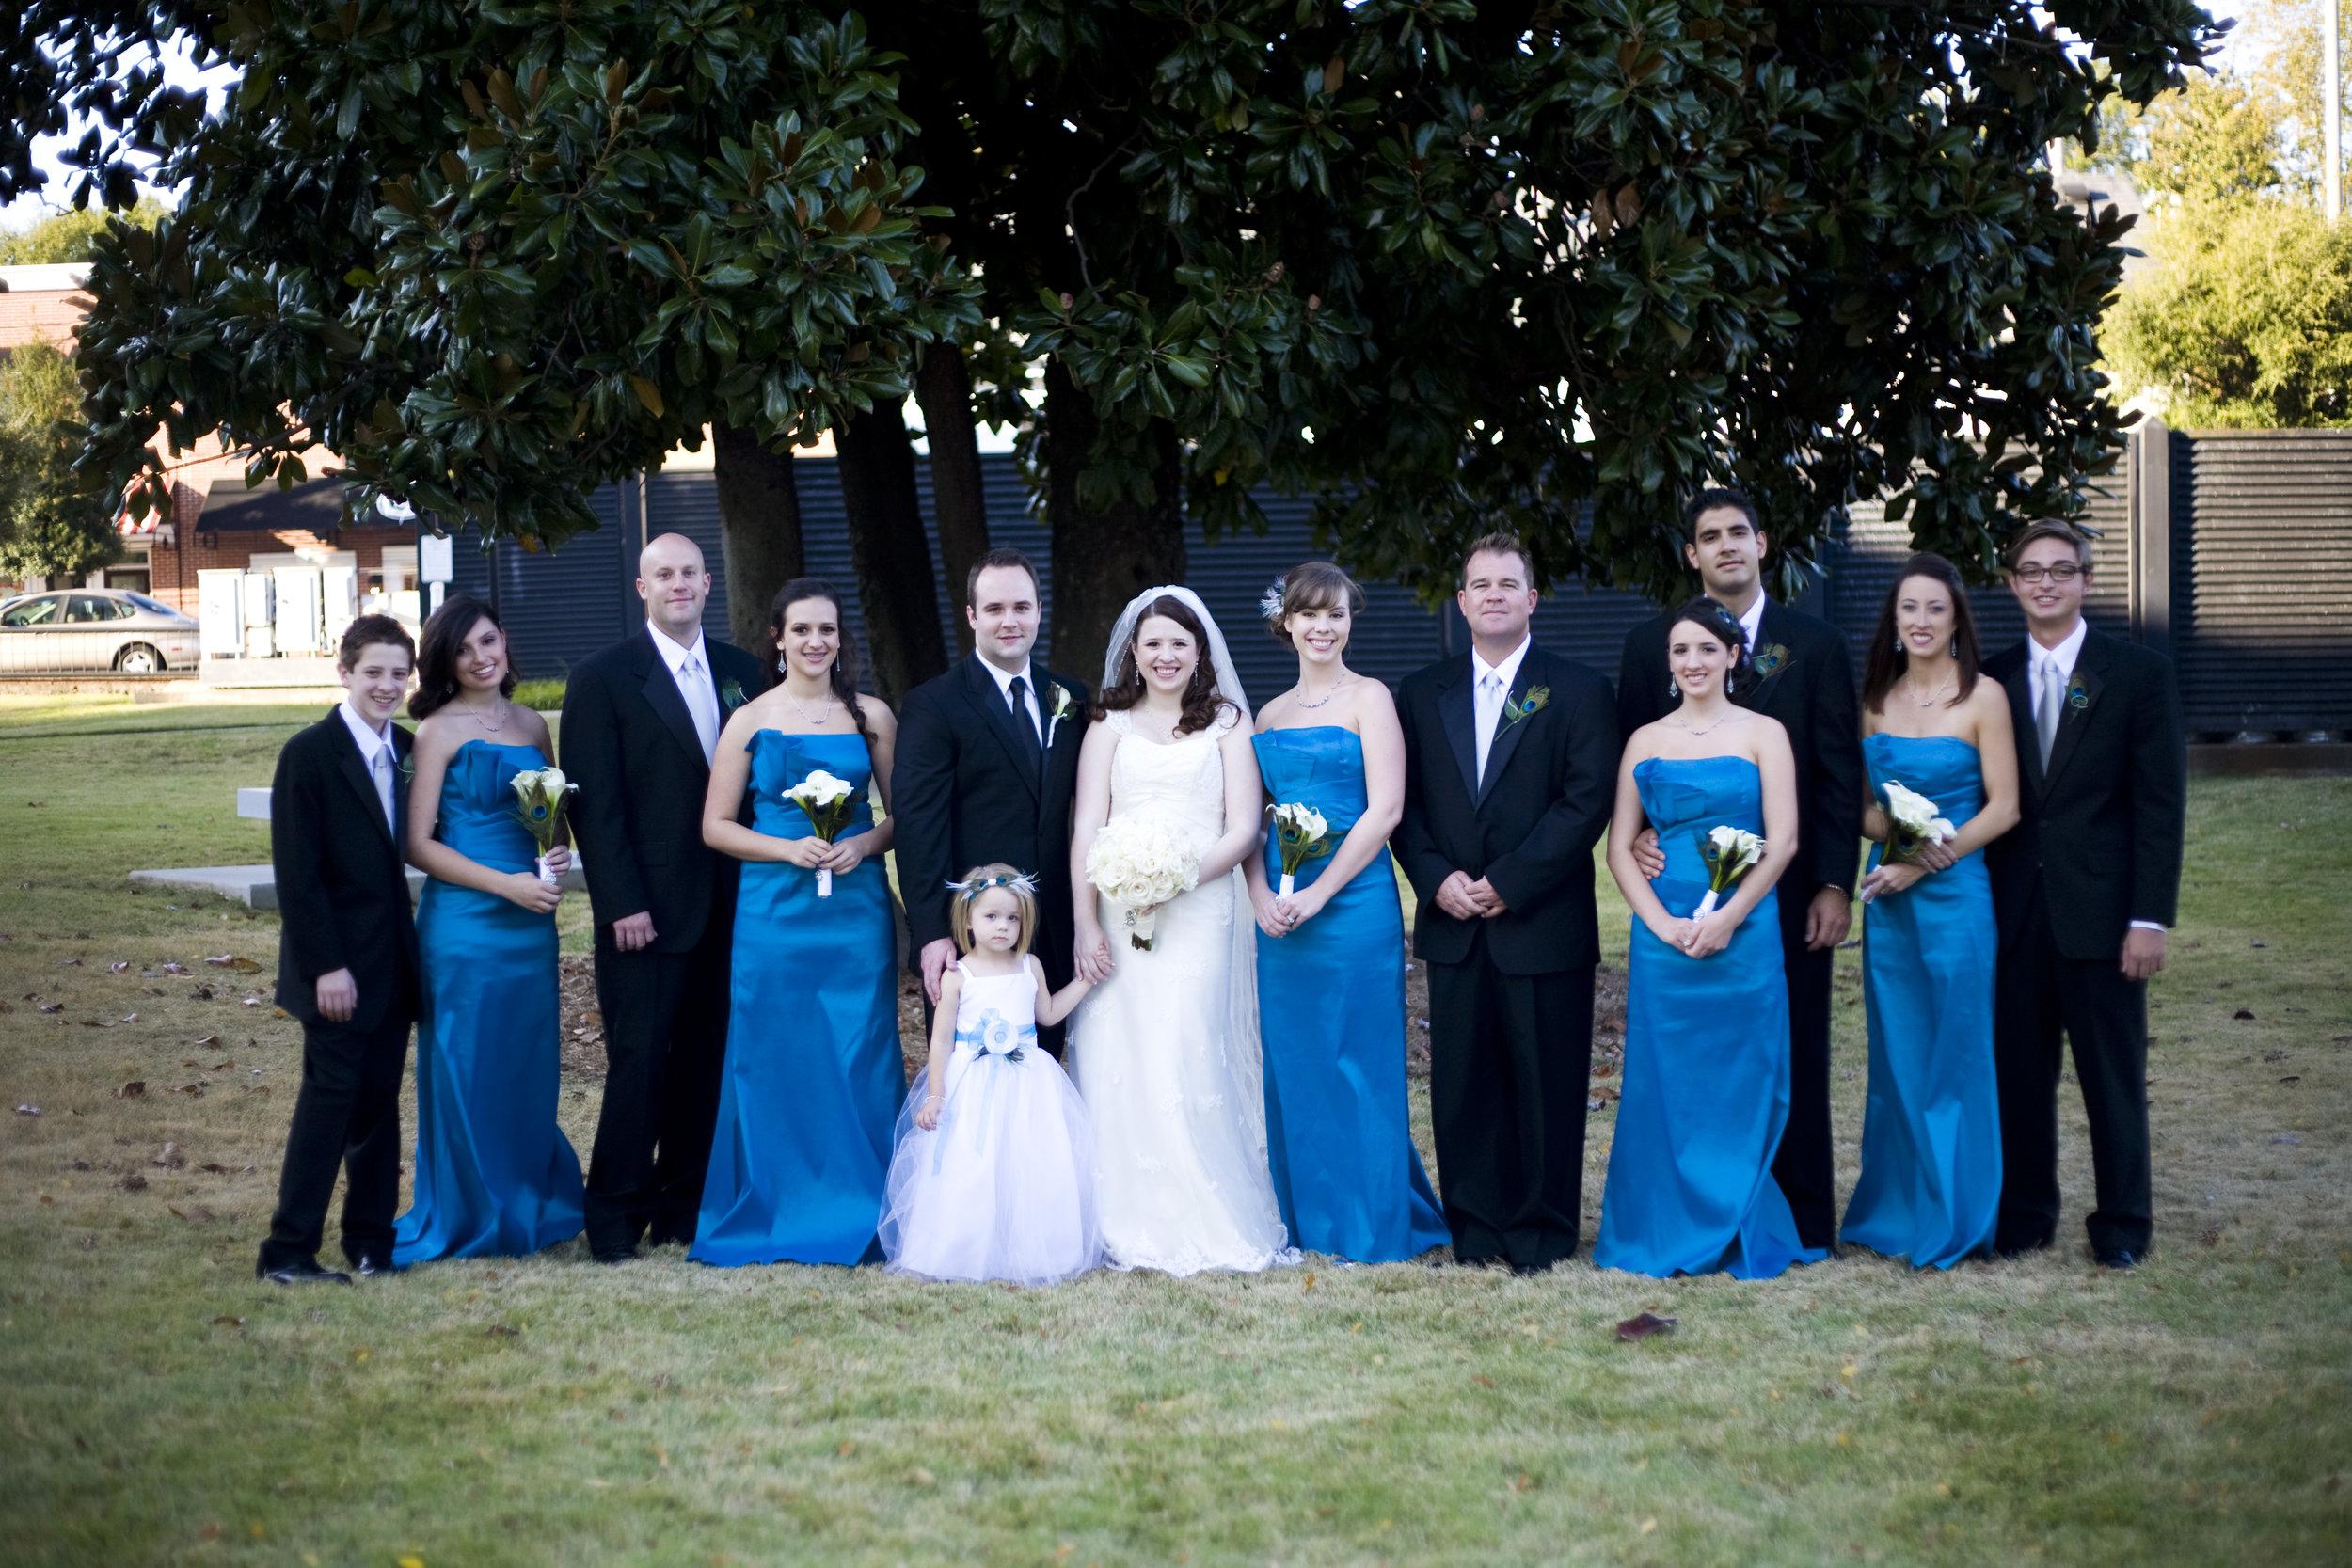 nicolina.co wedding post